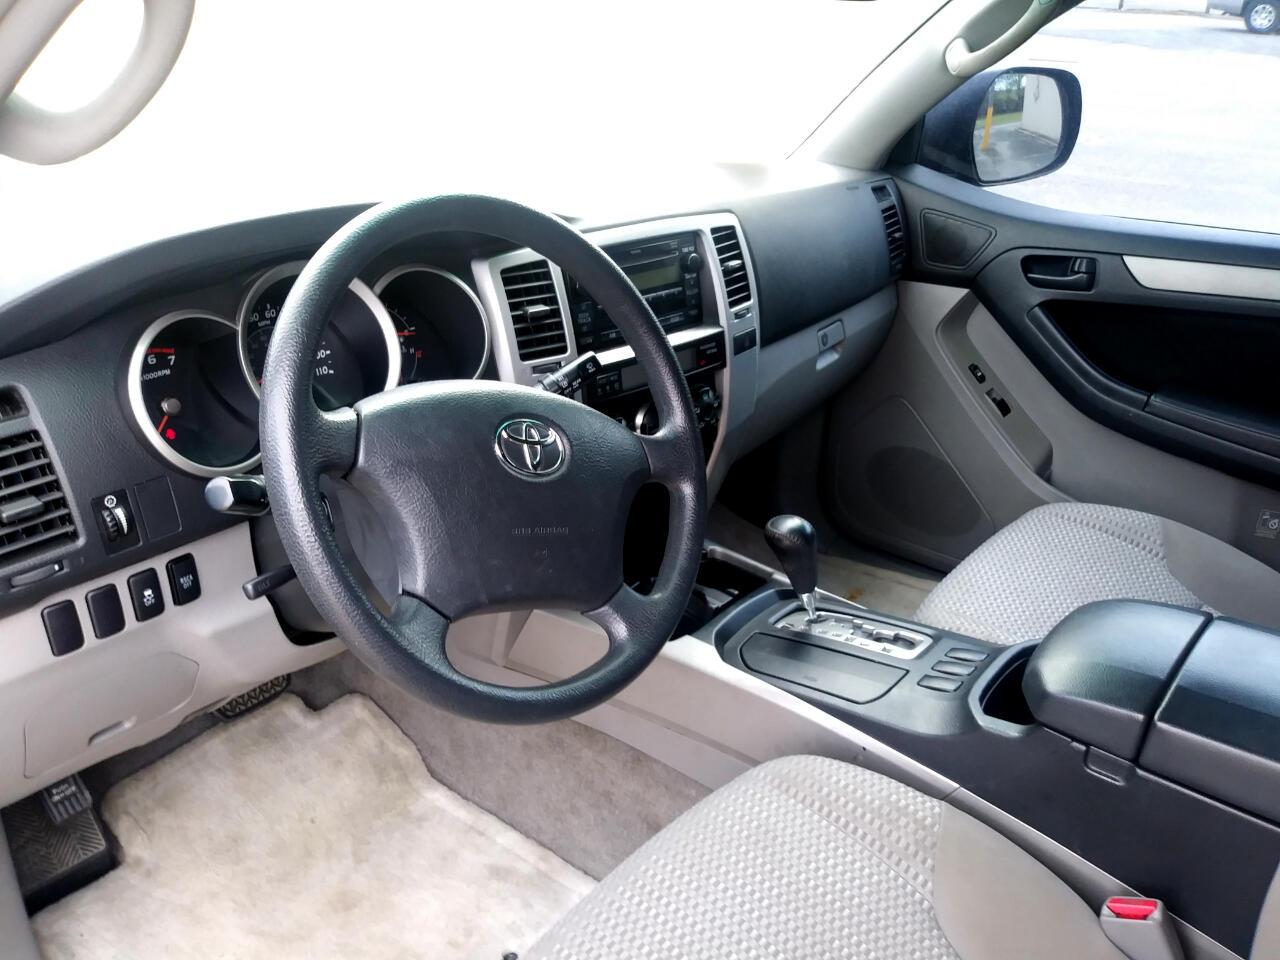 2008 Toyota 4Runner Sport Edition 2WD